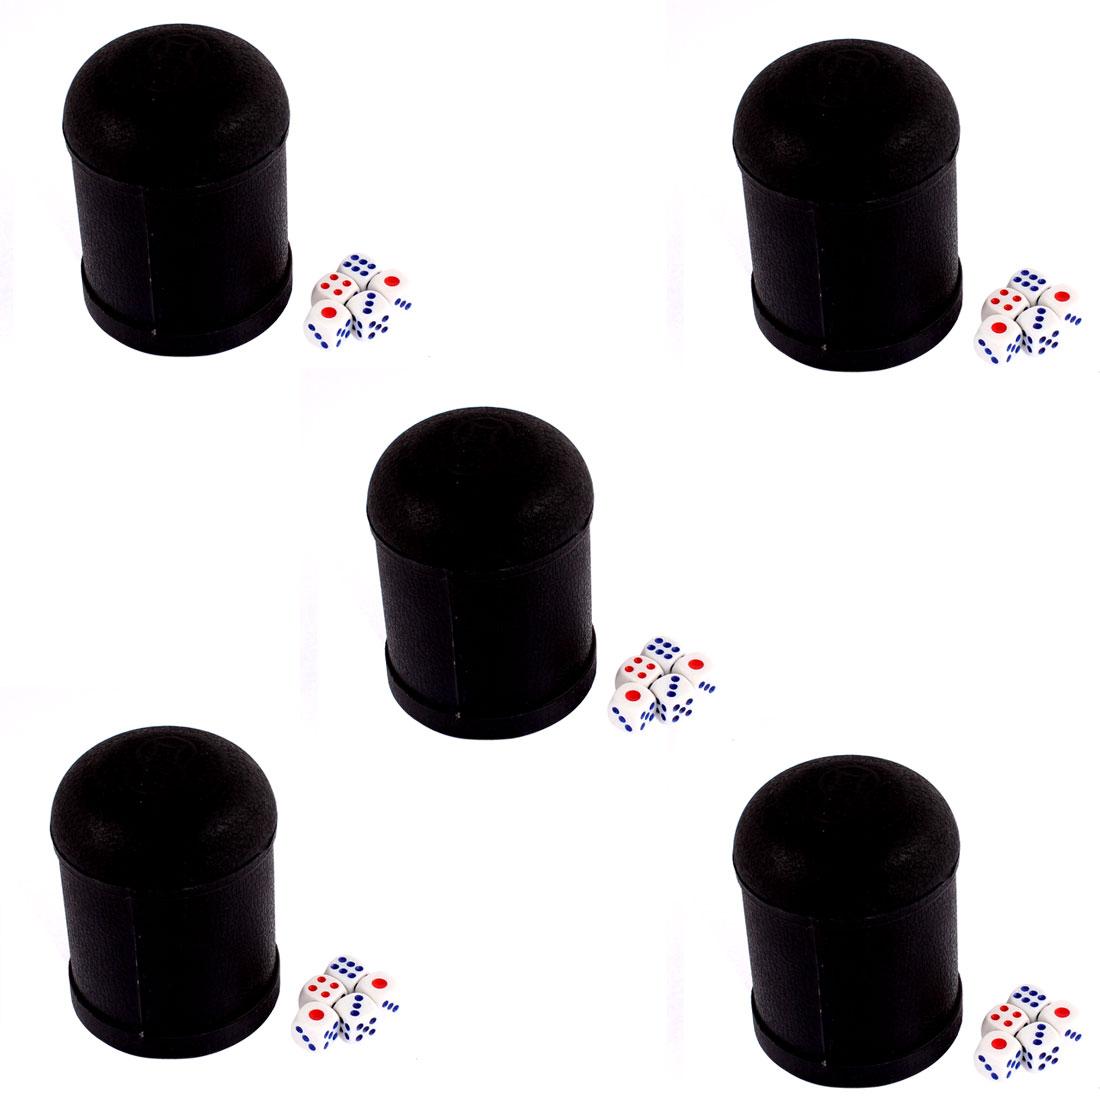 Pub Bar KTV Casino Lucky Games Plastic Shaker Cup Black 5pcs w 25pcs Dices